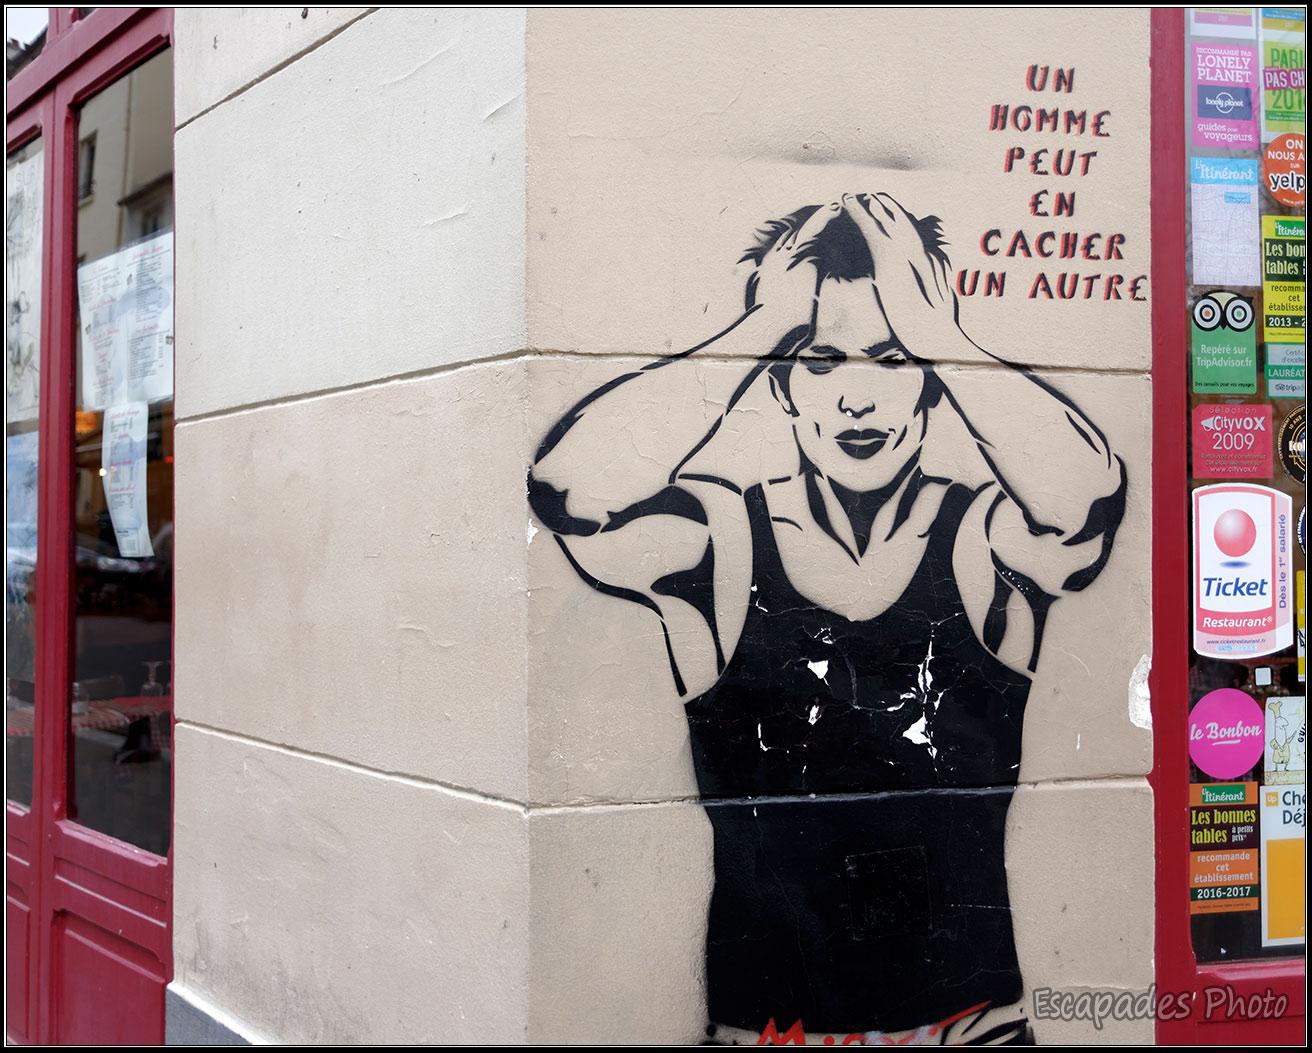 Miss Tic: Le street art qui leurre